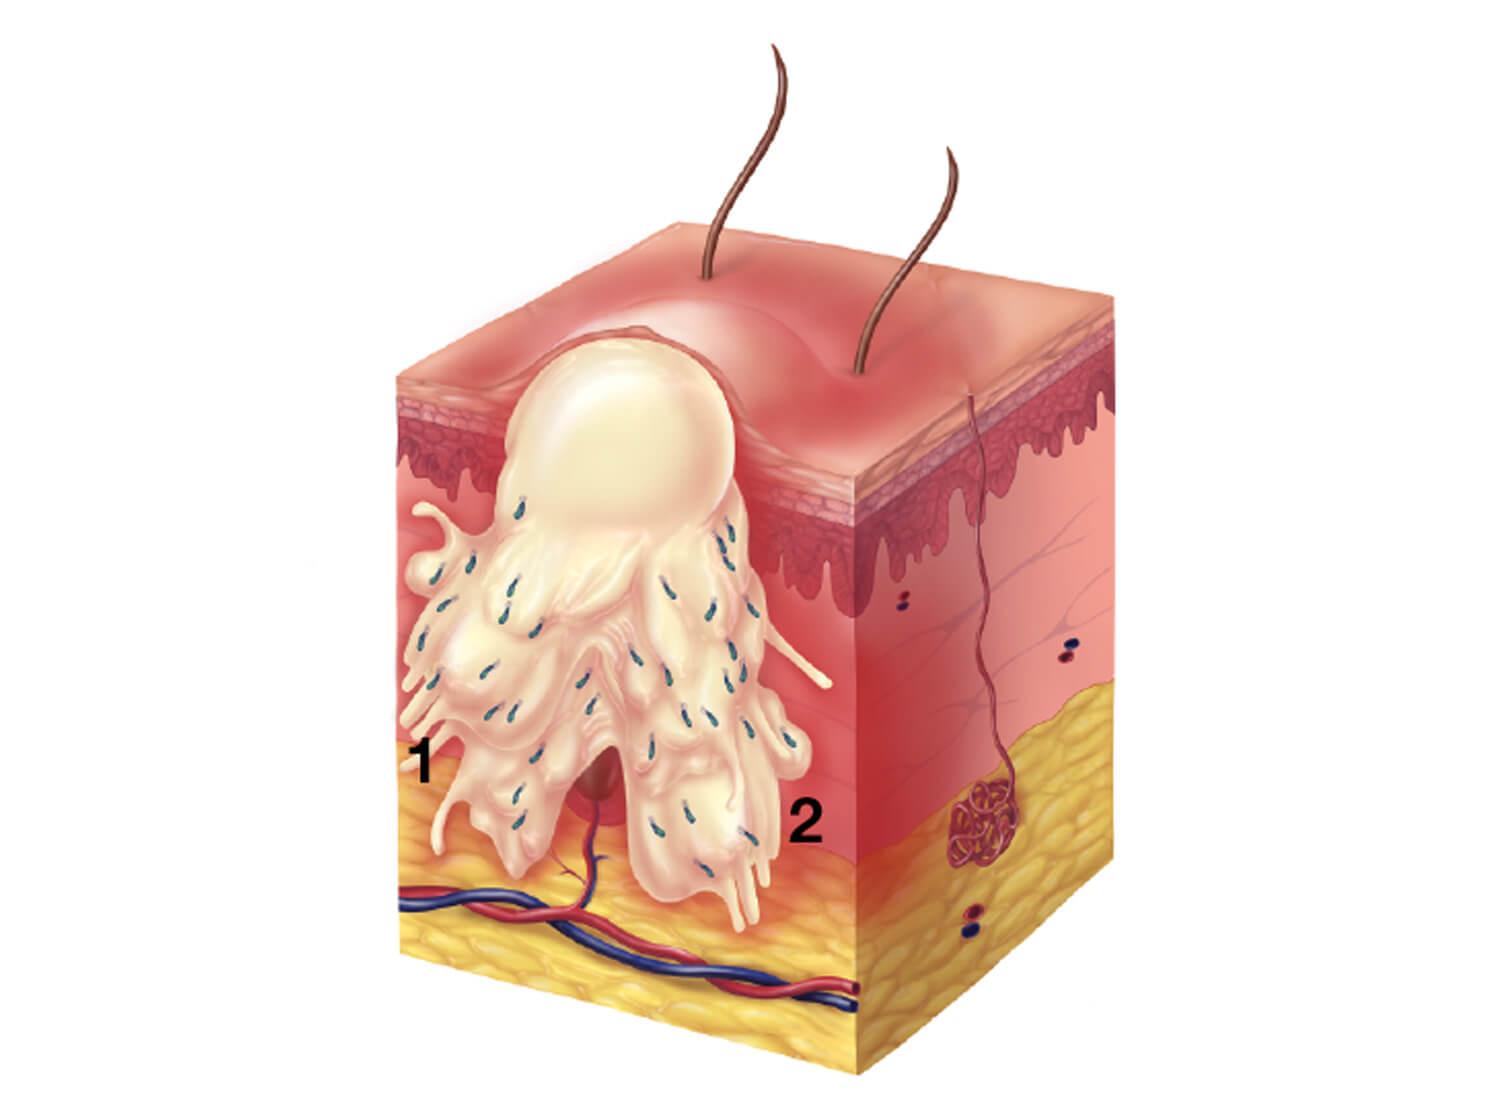 Illustration of a nodule